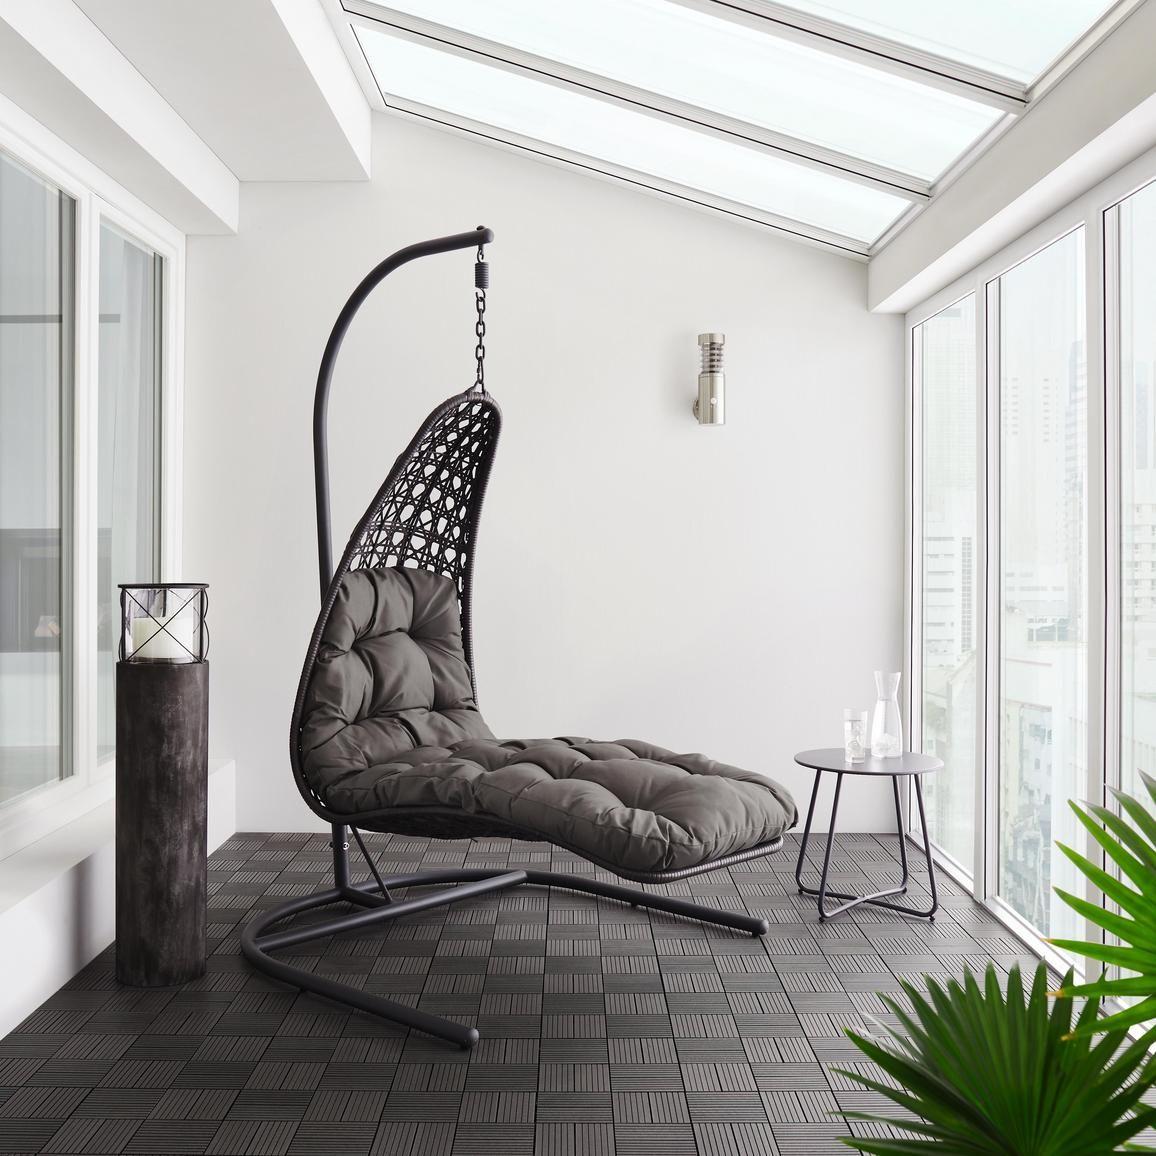 Hangesessel Betty Inkl Auflage Dunkelgrau Modern Kunststoff Textil 118 196 160cm Modern Living Hangesitz Grau Mobel Sale